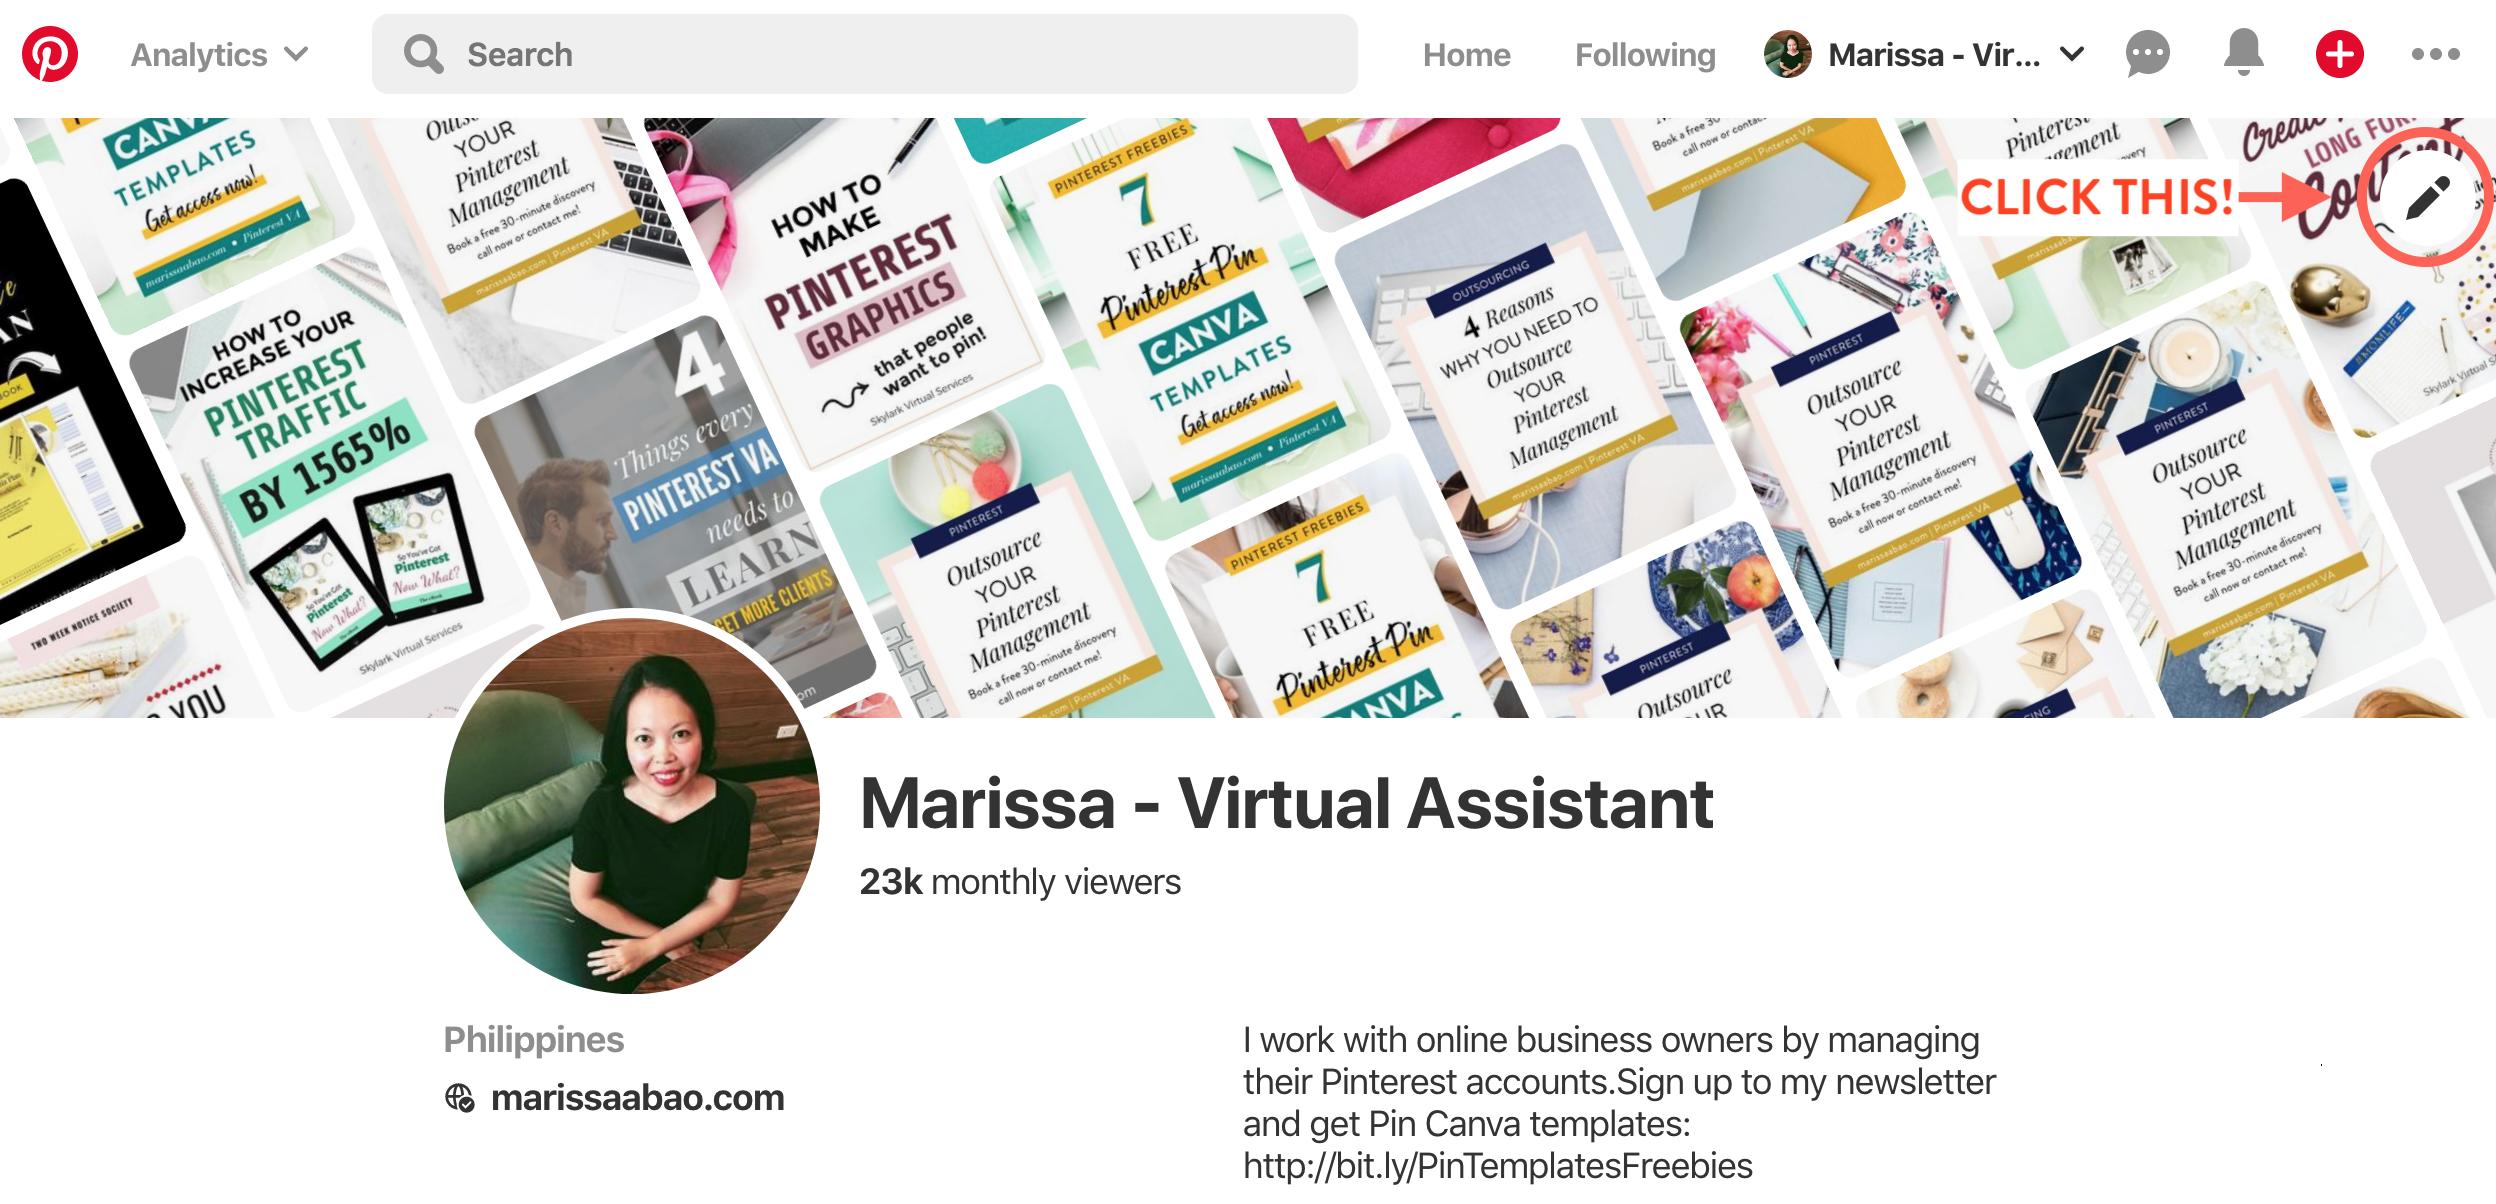 Pinterest Profile #pinterestvirtualassistant #pinterestva #virtualassistant #pinterestmanagement